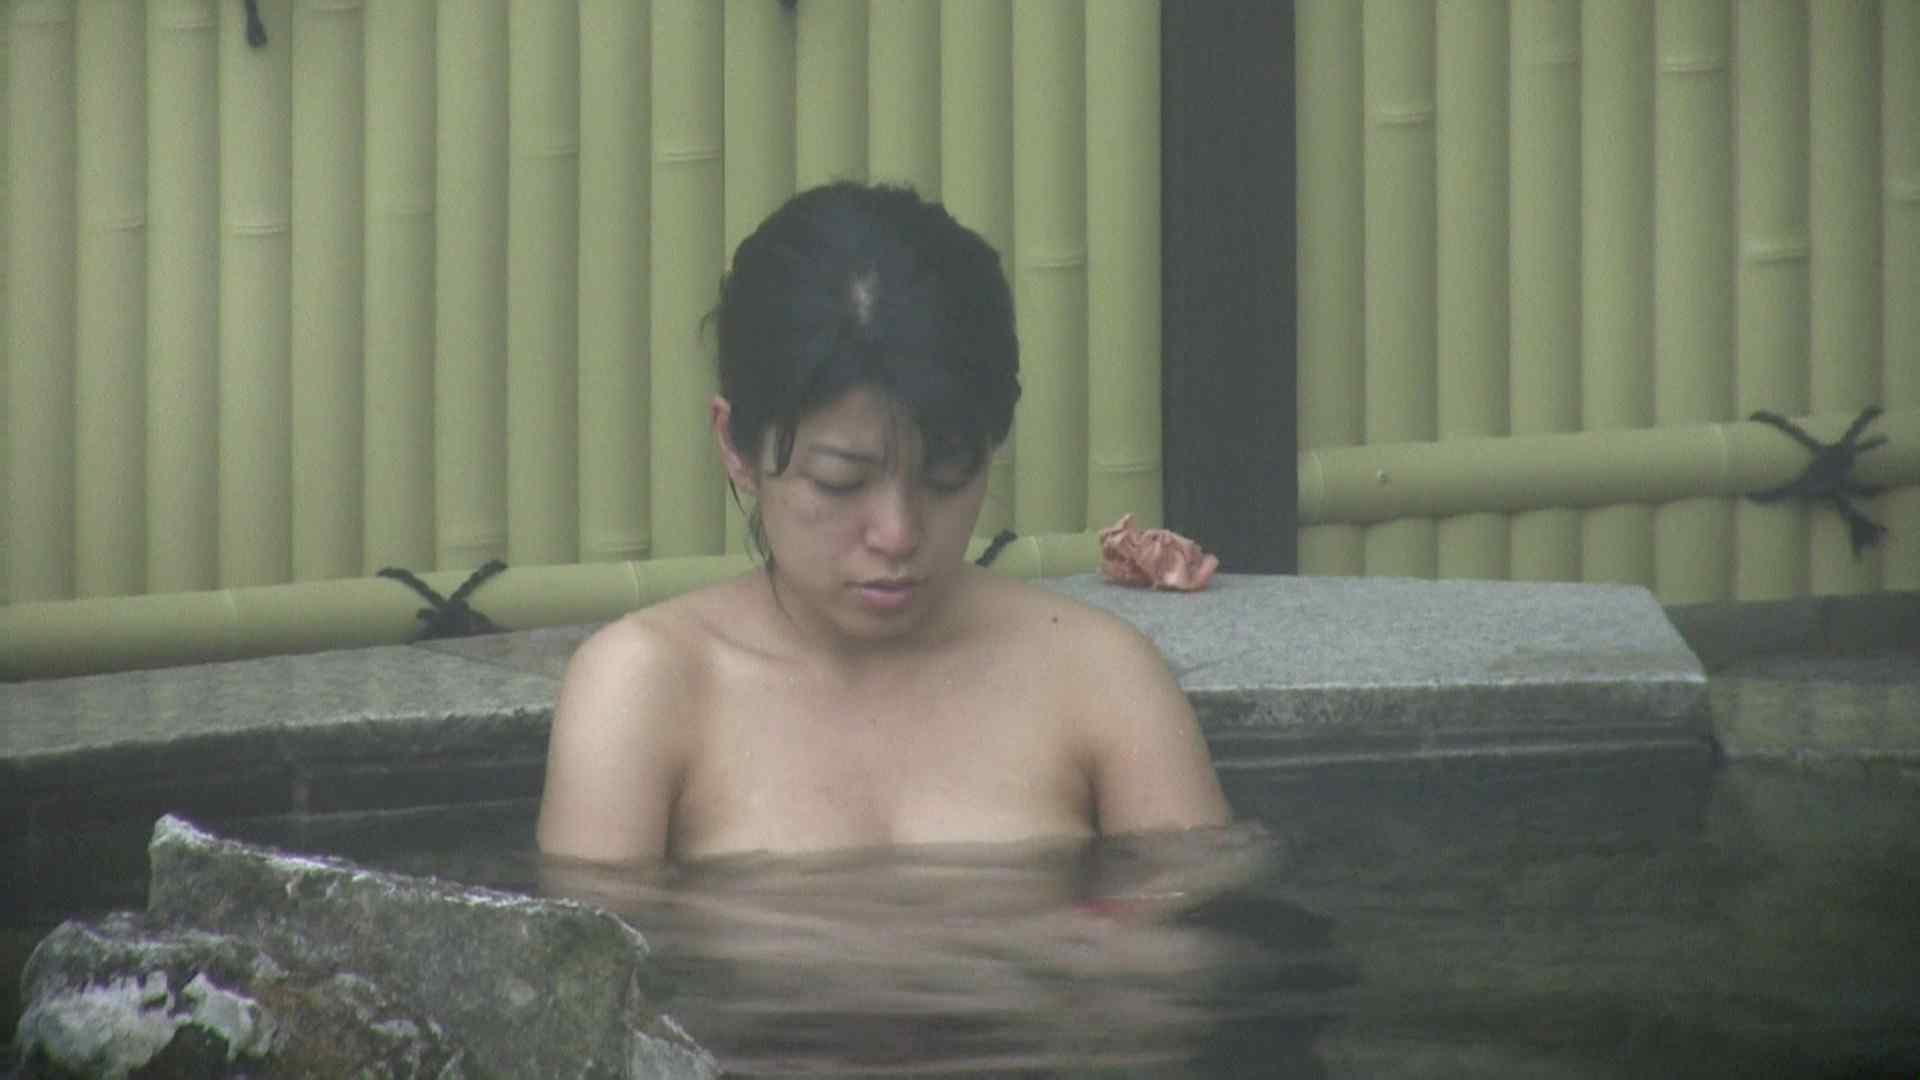 Aquaな露天風呂Vol.585 HなOL | 盗撮  93pic 86